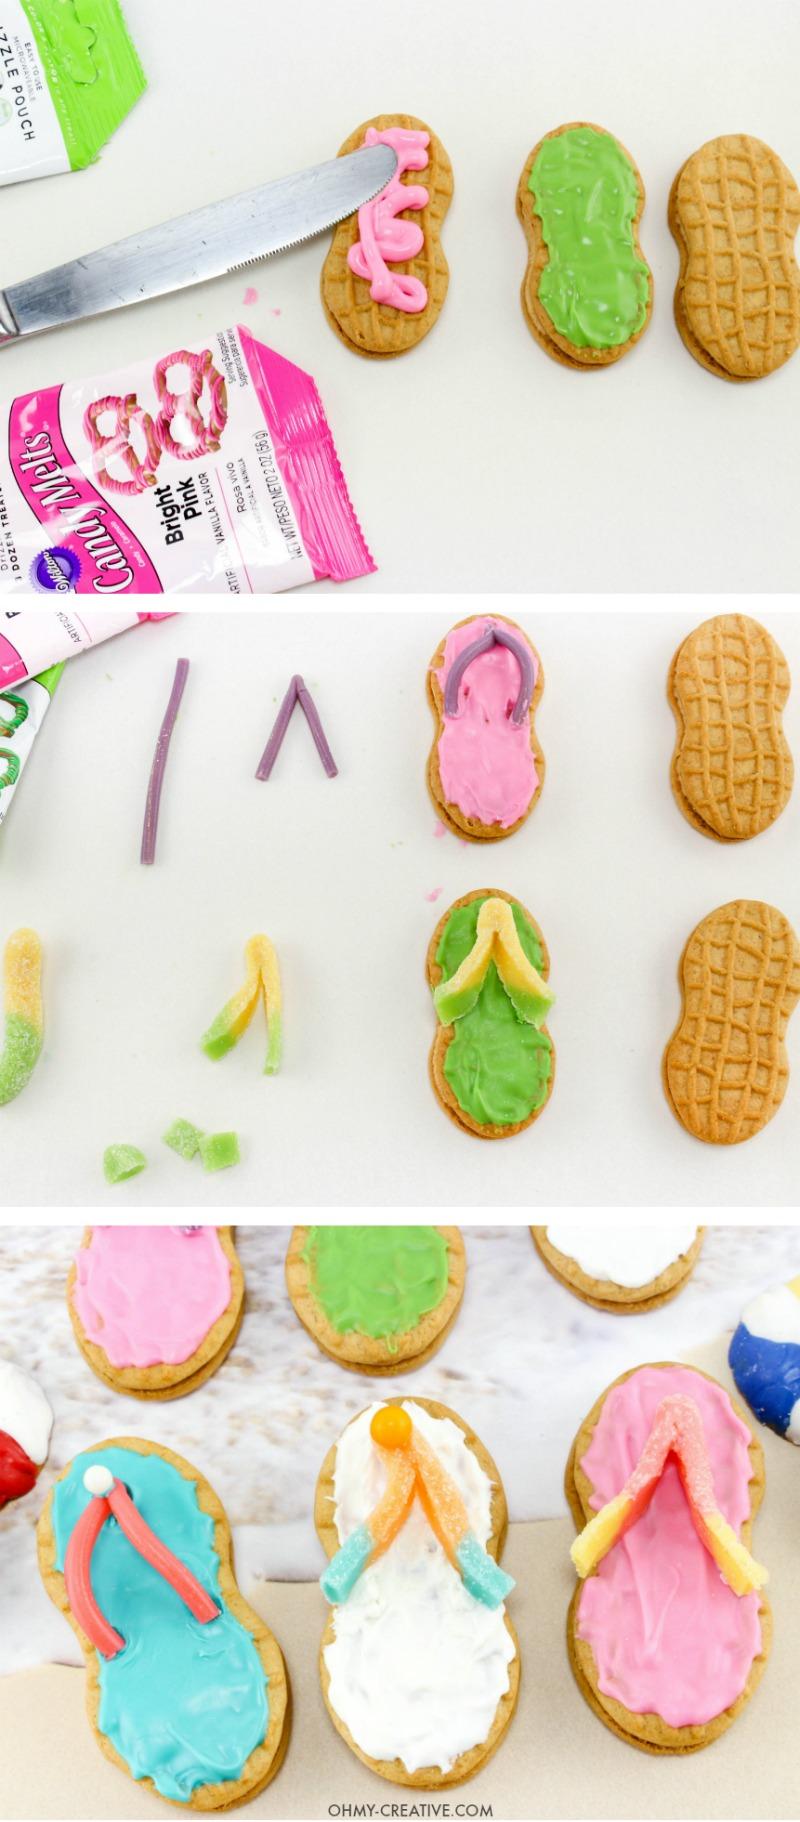 How to make Nutter Butter Flip Flop Cookies | Summer Desserts | Beach Party Cookies | Beach Theme Party Desserts | Pool Party Desserts | Nutter Butter Cookies | Luau Party | Easy Flip Flop Cookies | Sweets